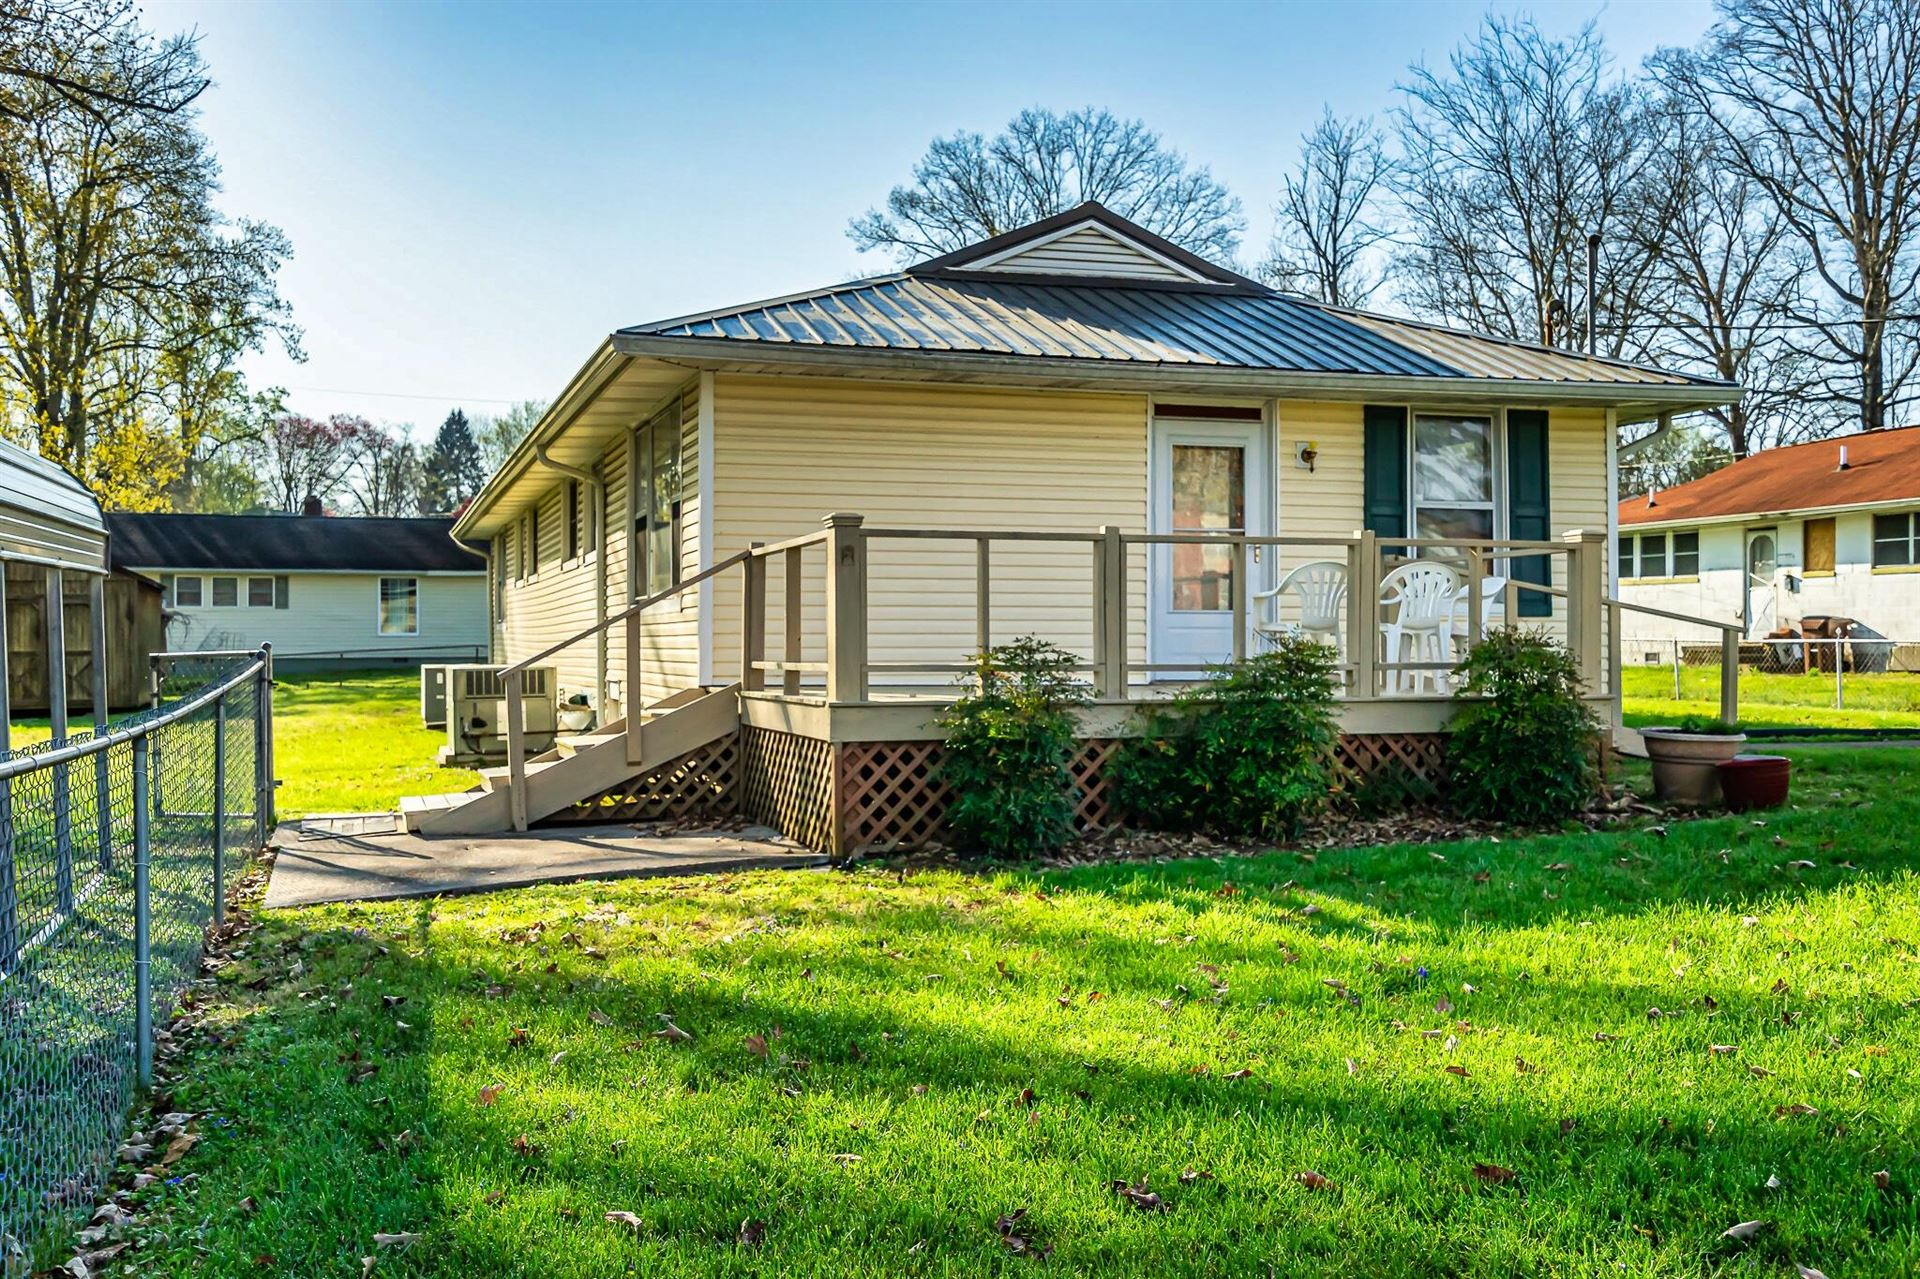 Photo of 195 N Purdue Ave, Oak Ridge, TN 37830 (MLS # 1148111)